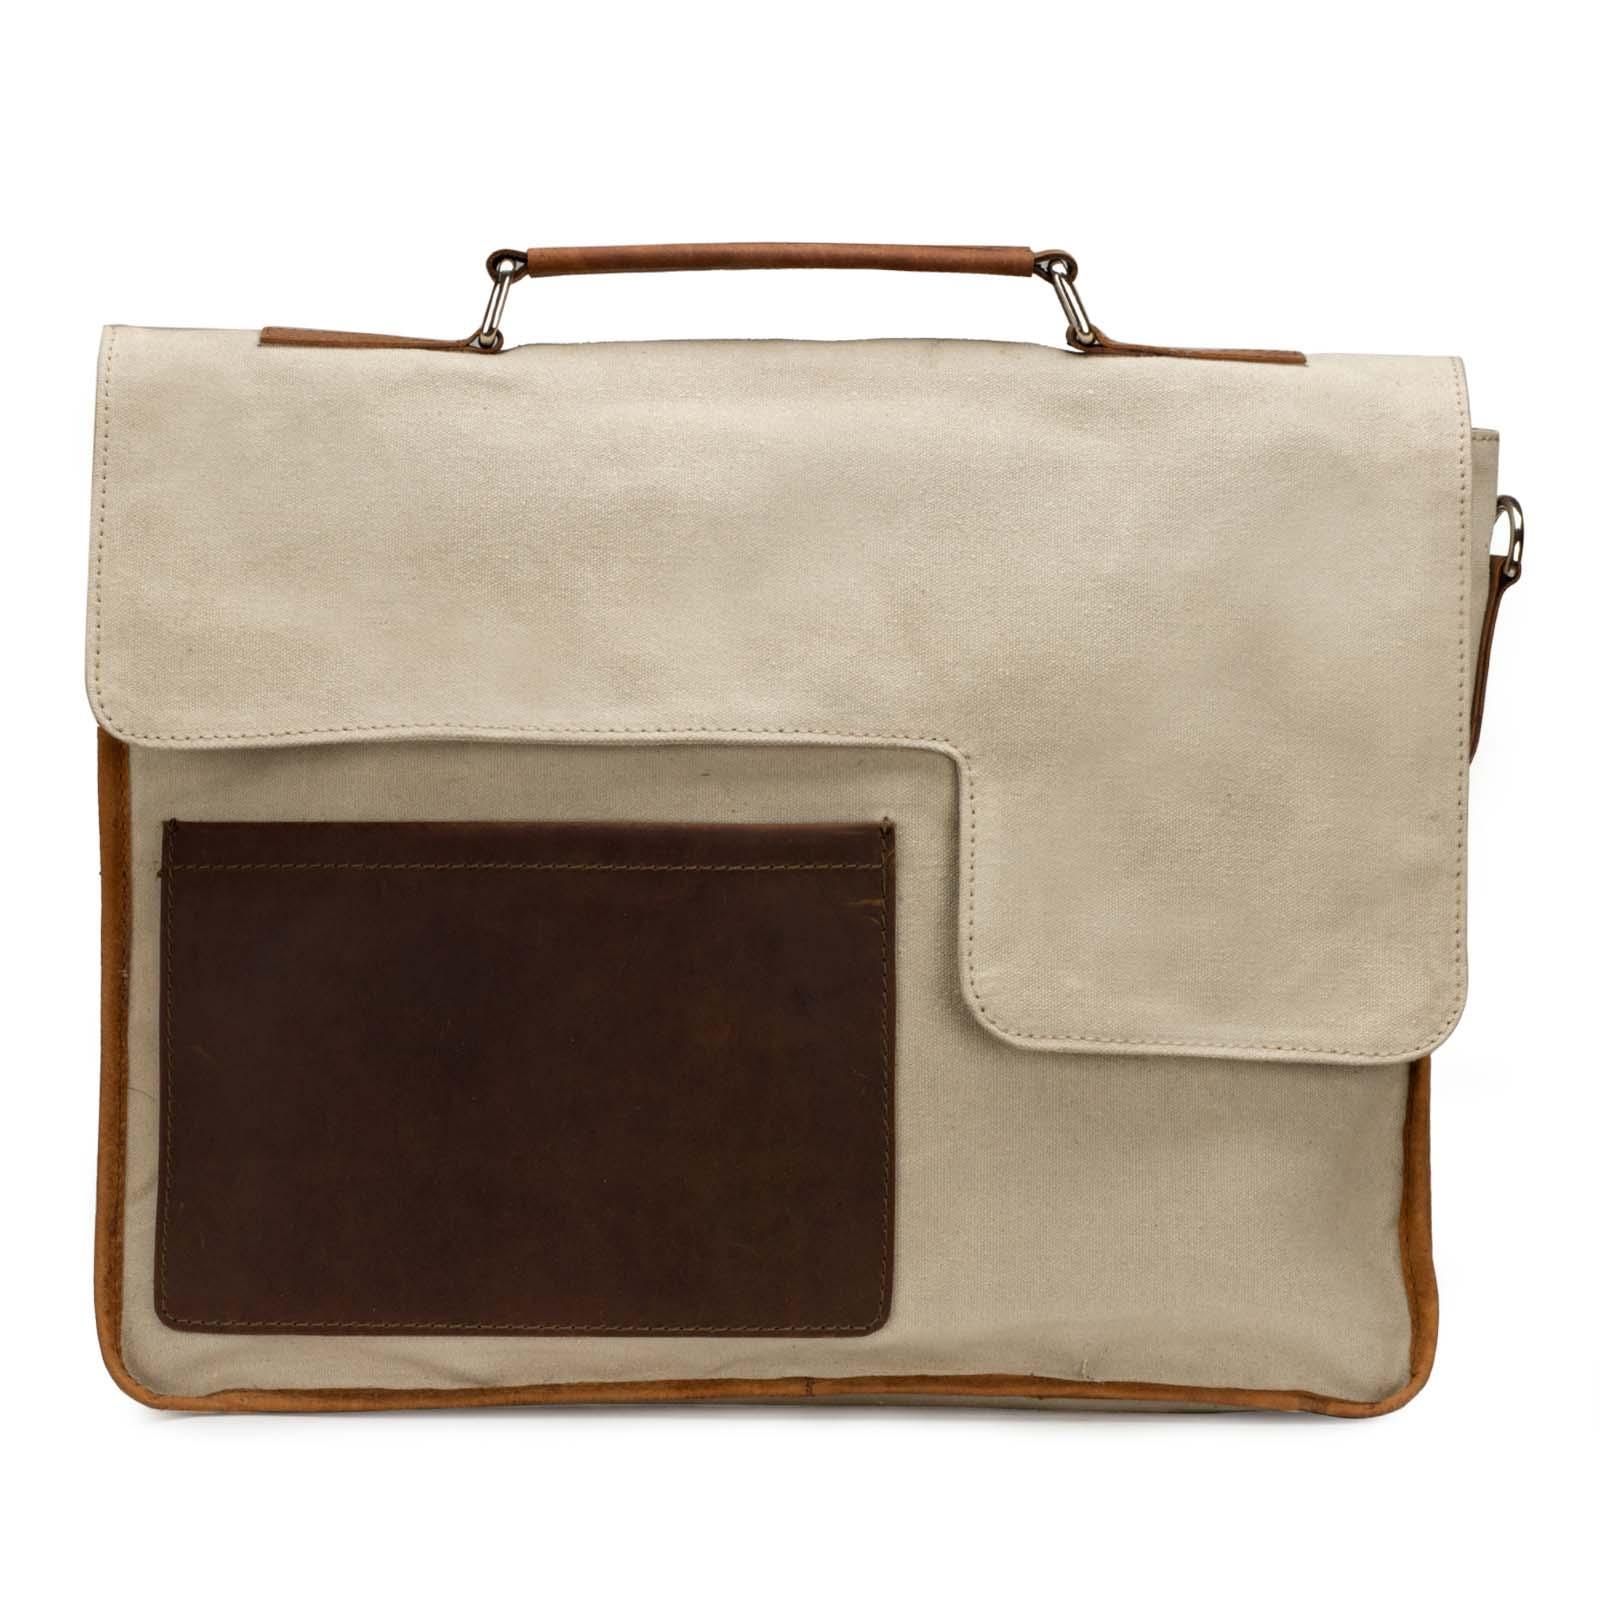 Khaki Canvas-Leather Messenger Bag